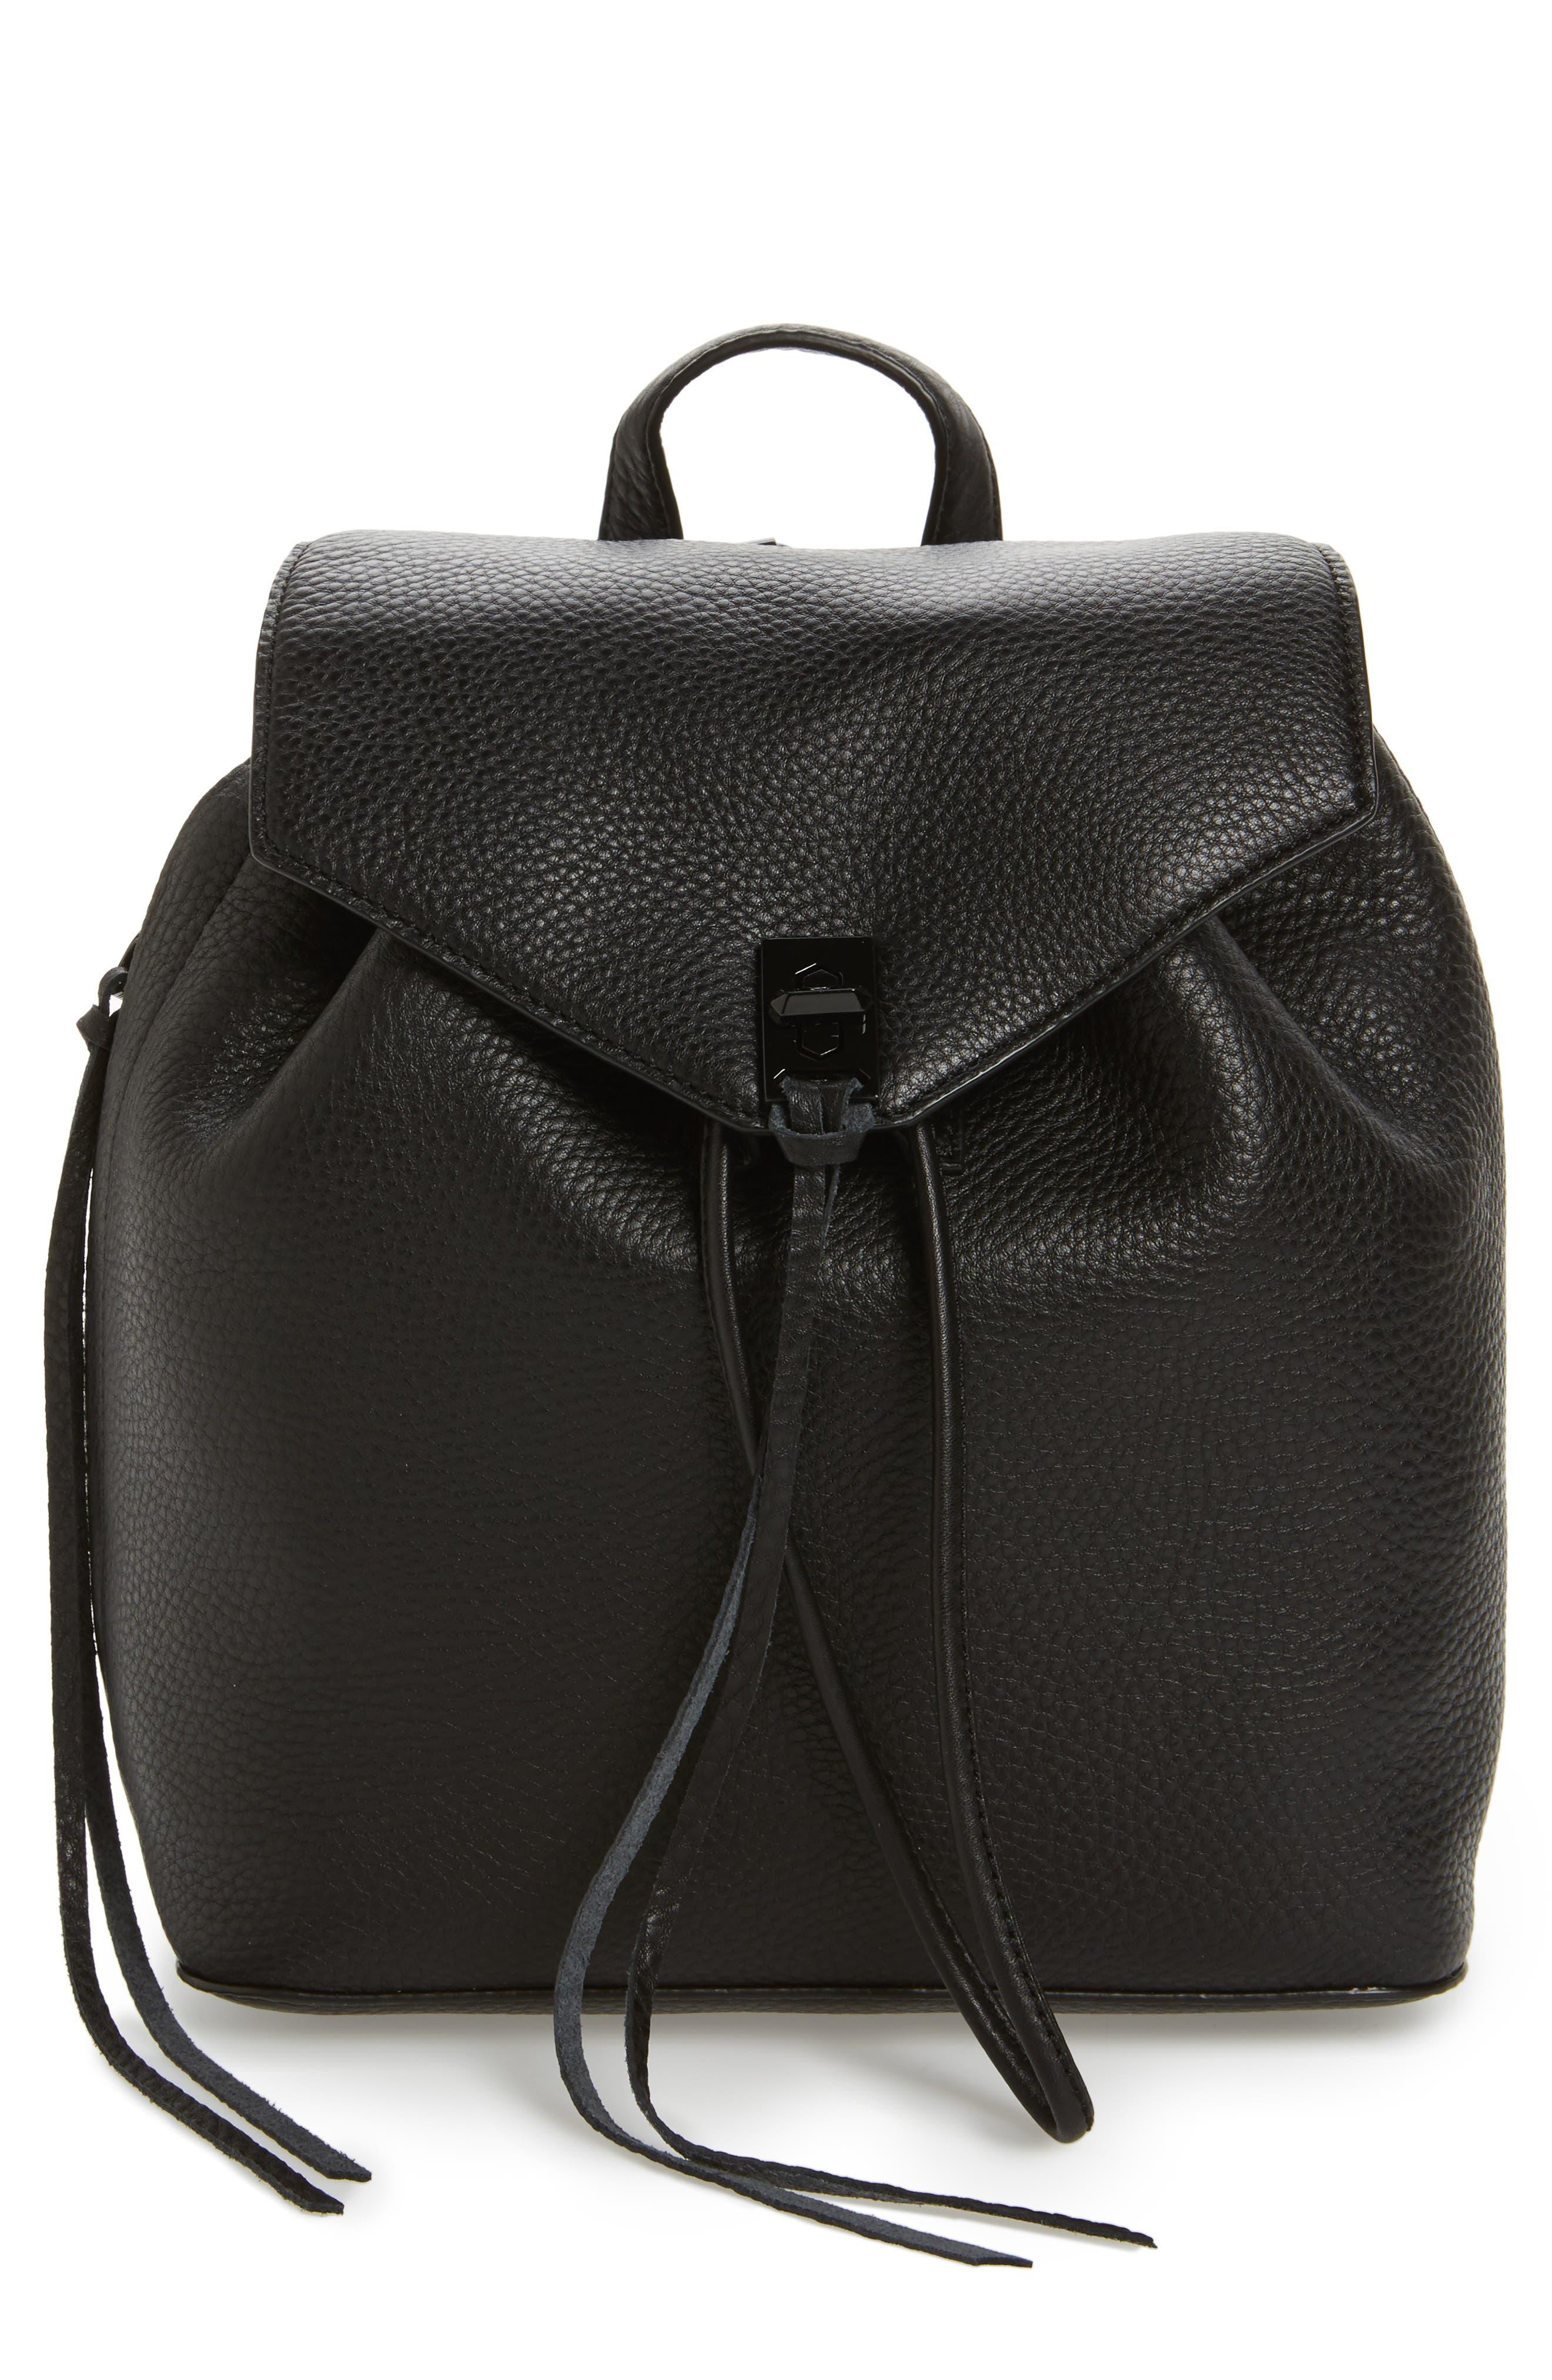 Rebecca Minkoff Medium Darren Leather Backpack